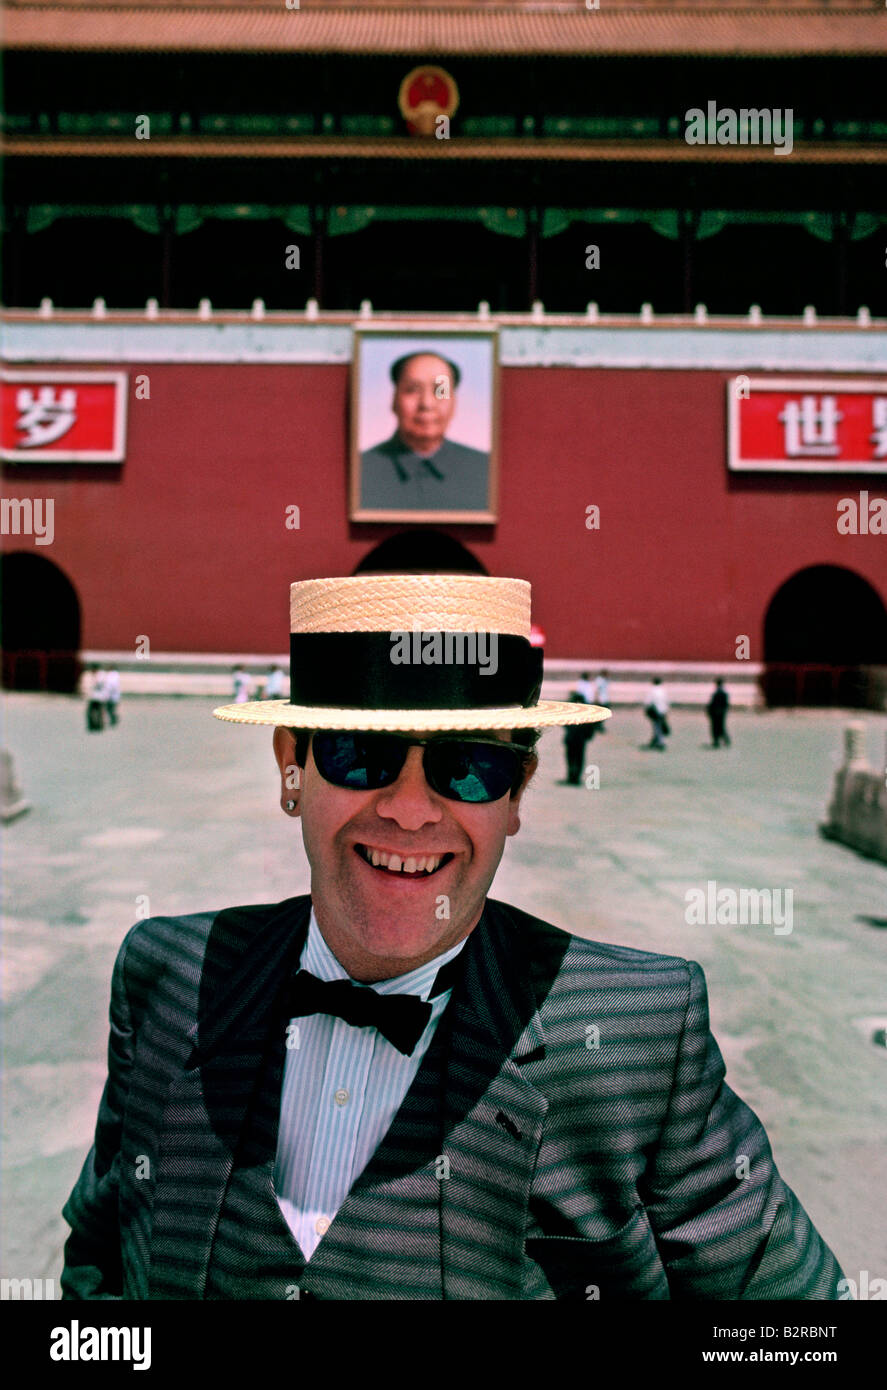 ELTON JOHN IN CHINA 1983 - Stock Image